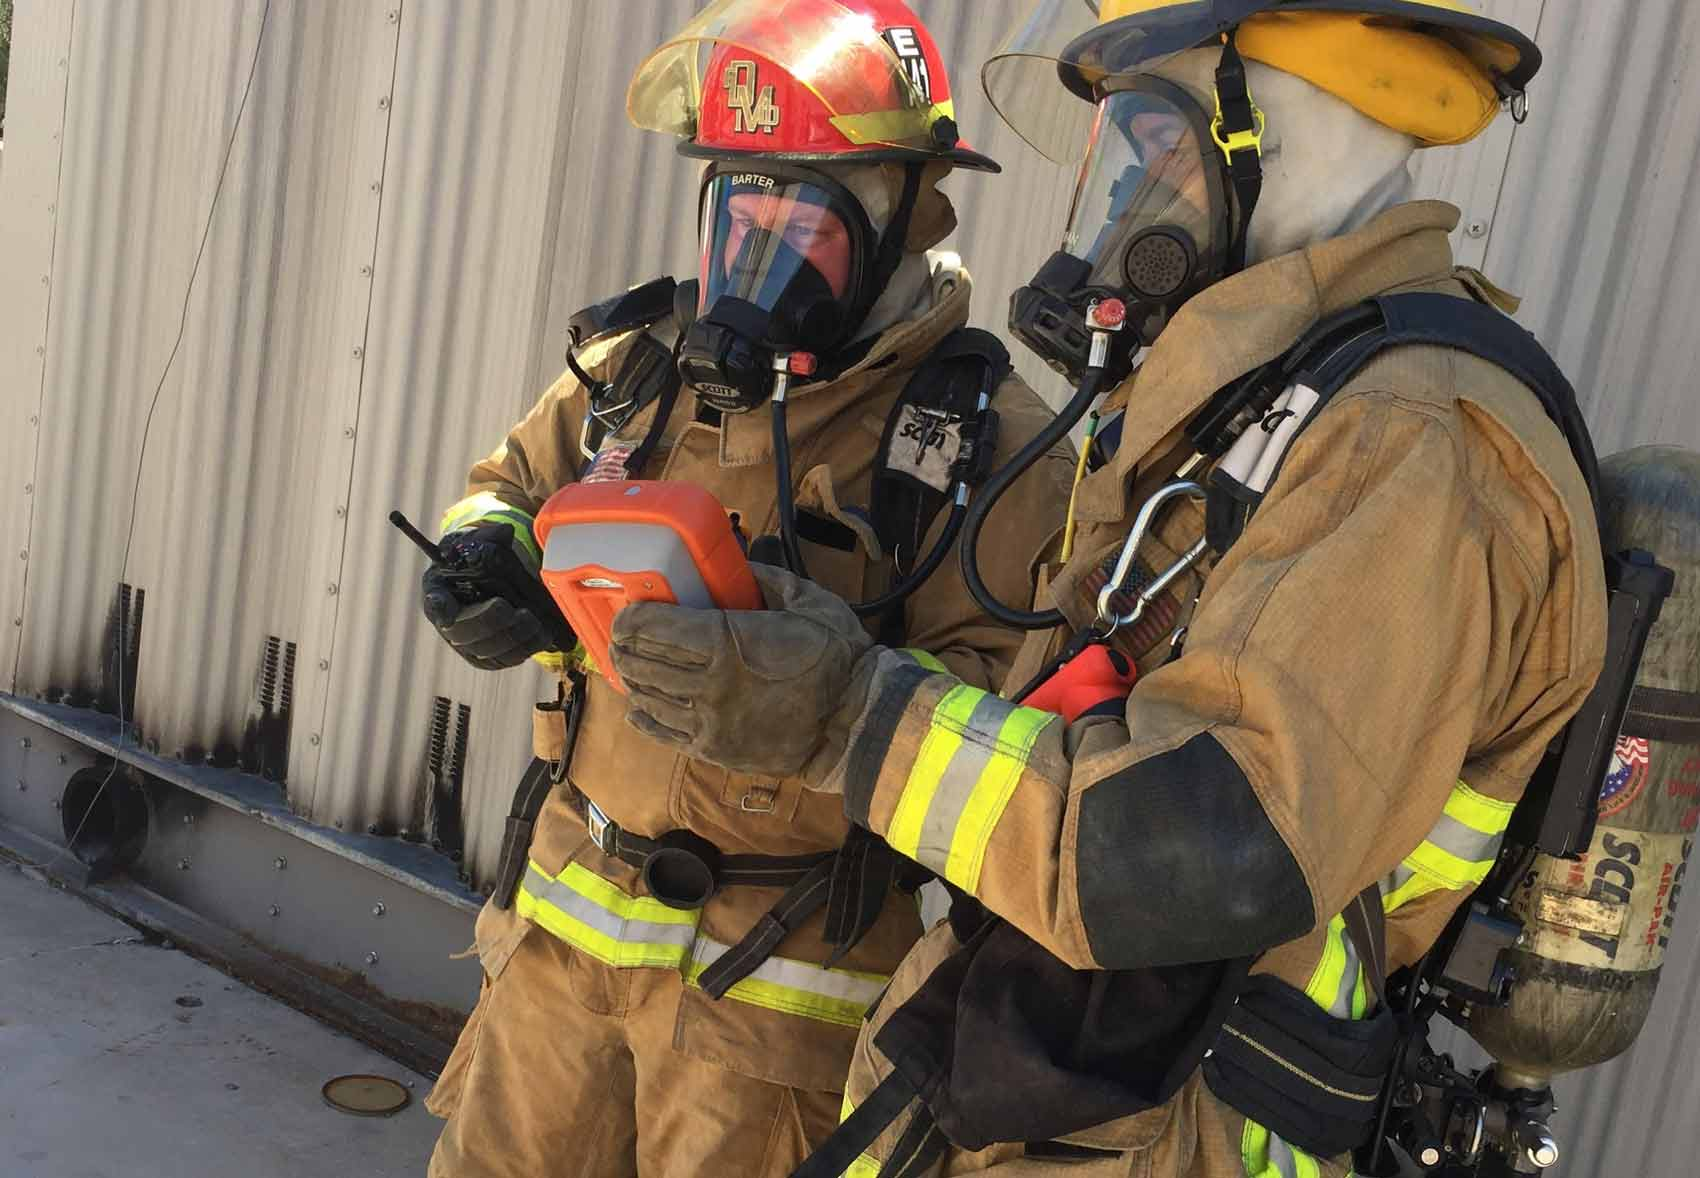 Equipment Management Software for Hazmat Response Teams